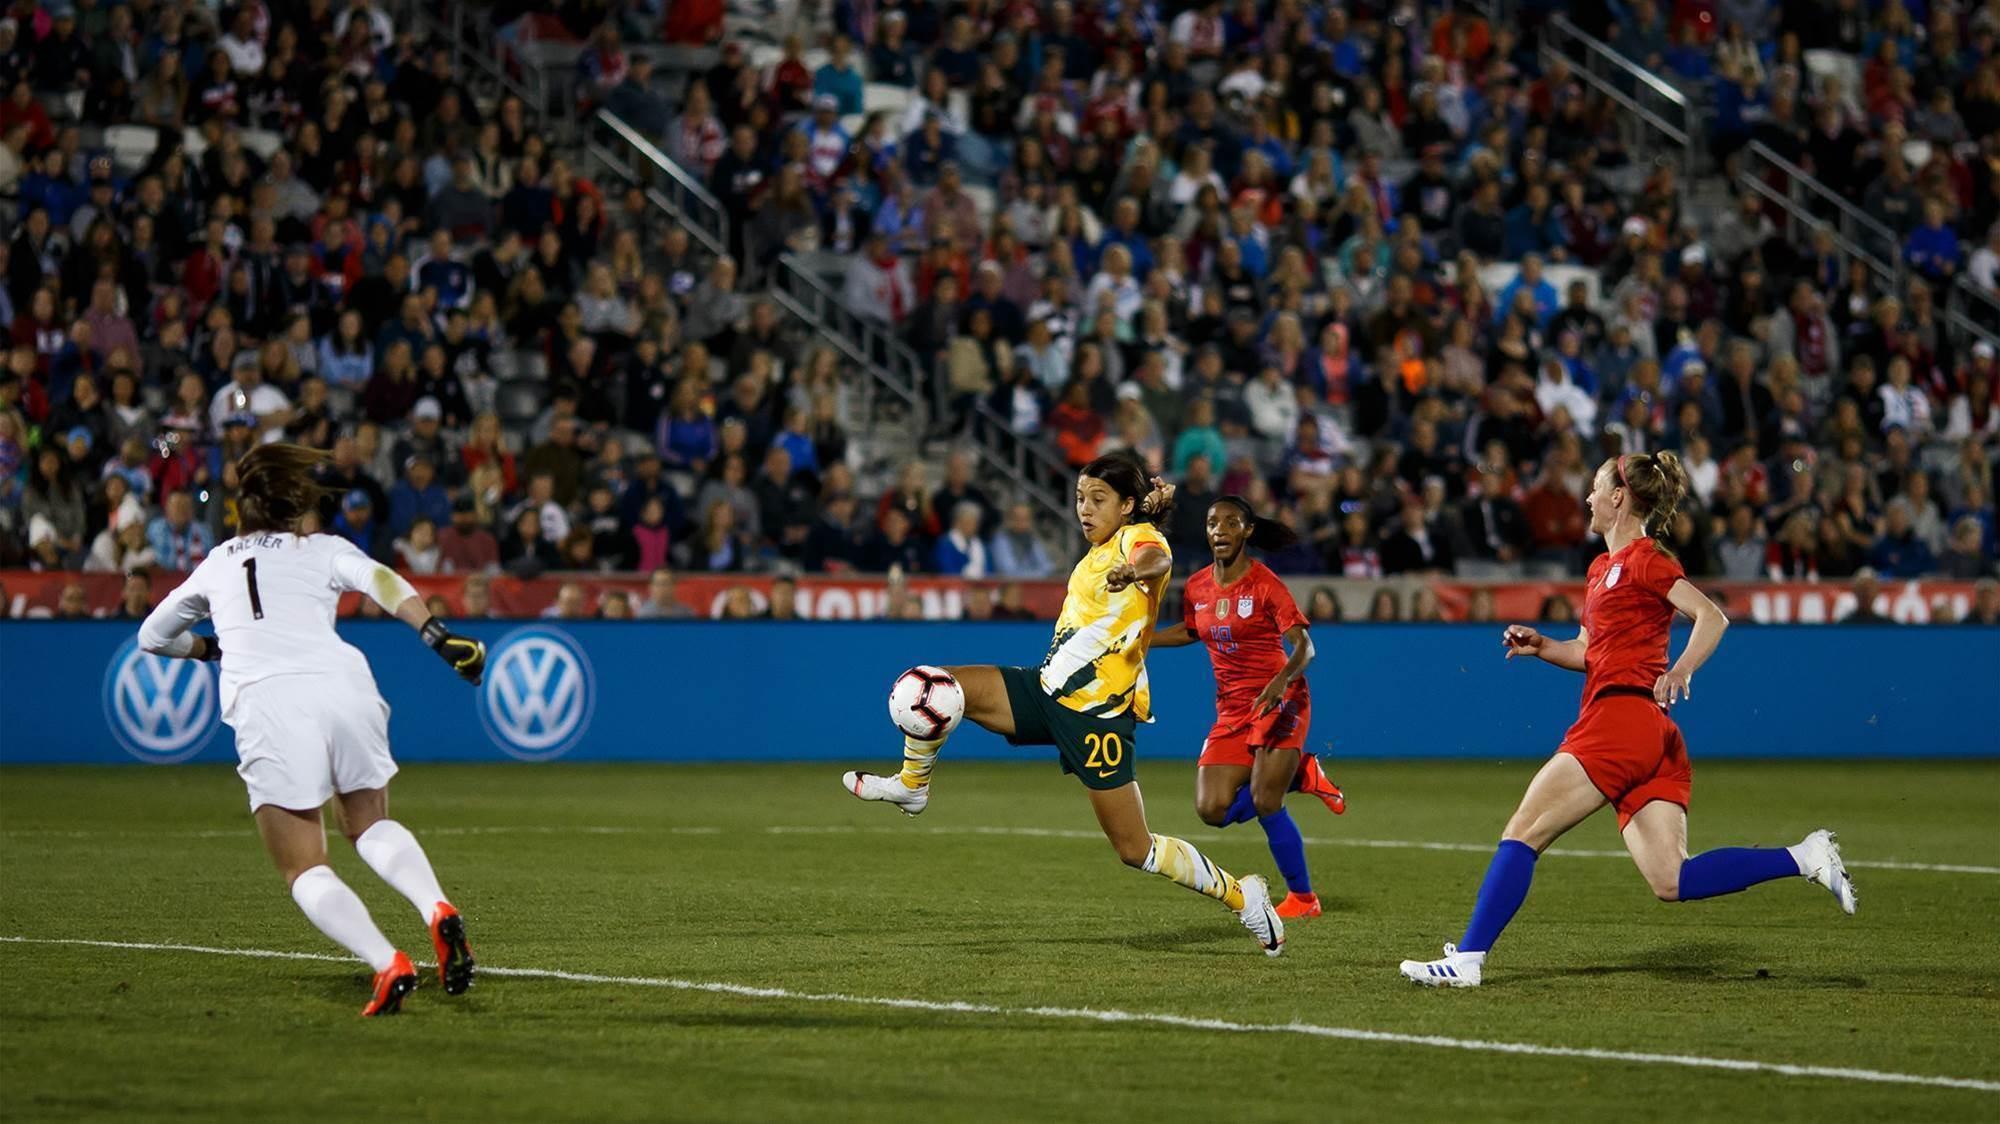 USA win in goal bonanza